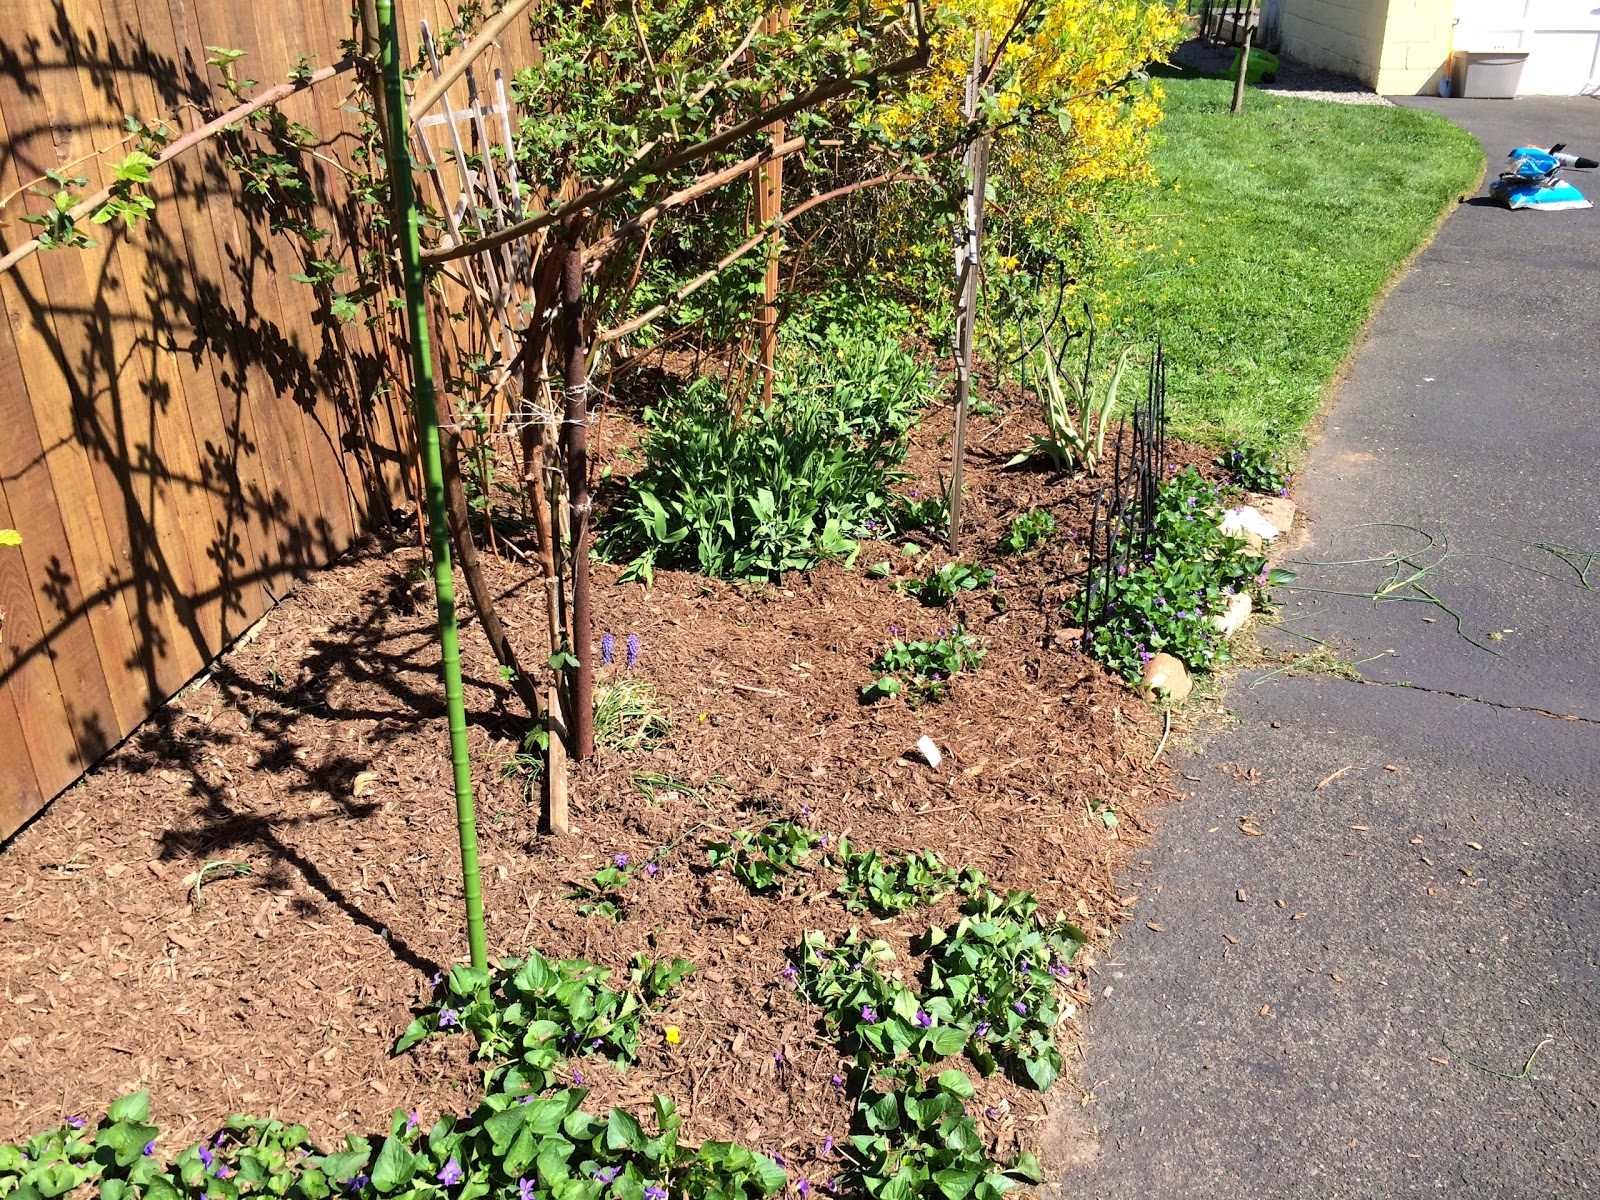 In the Little Yellow House: Backyard Garden Bed Progress